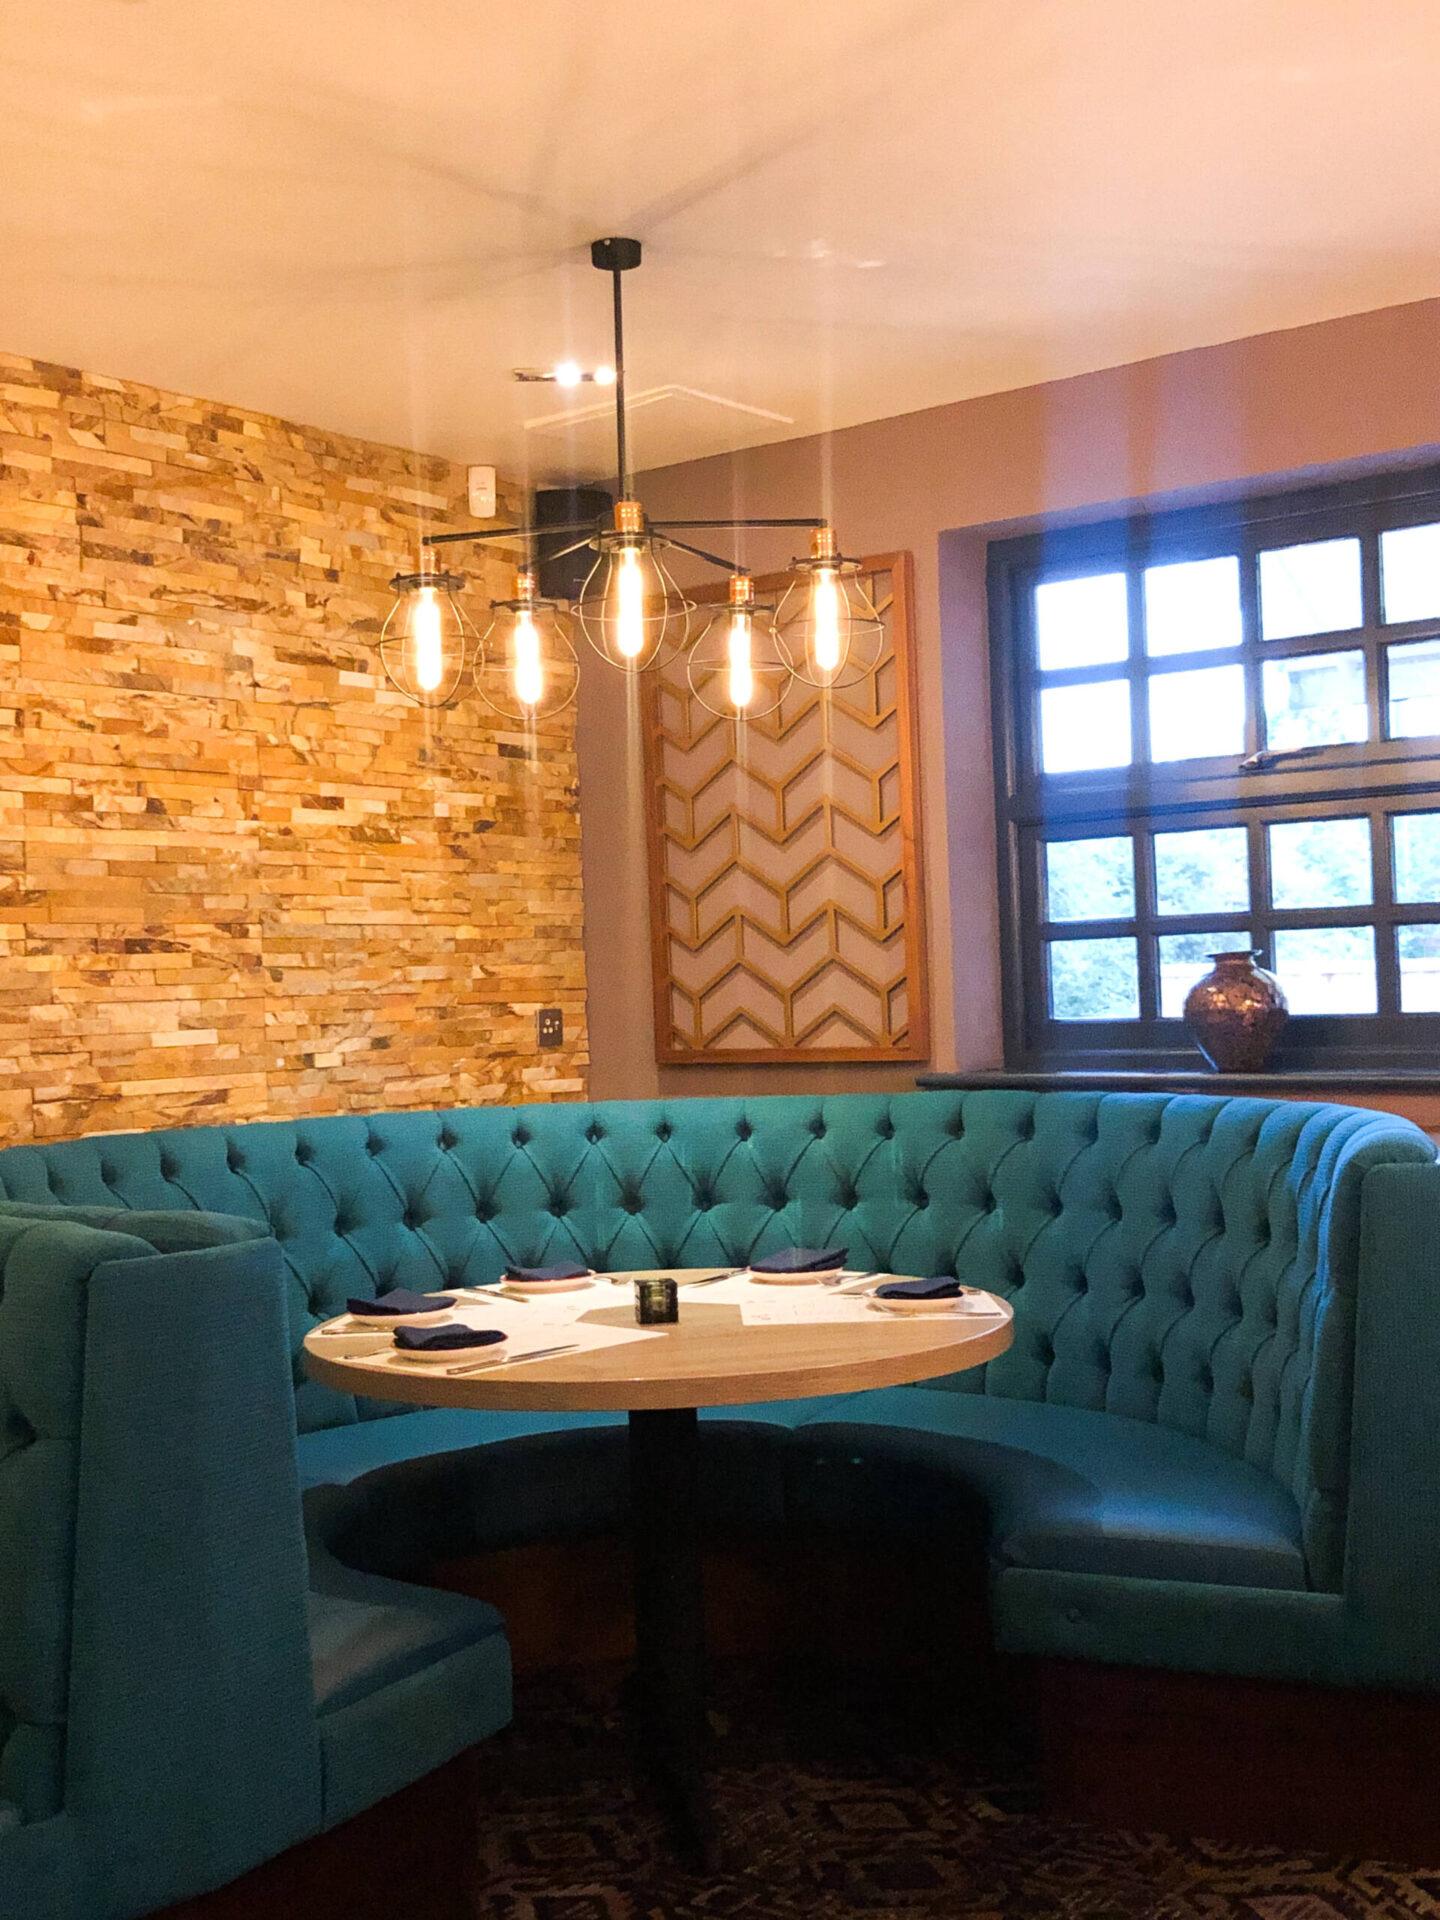 Entouraj - Droitwich Indian Restaurant Booth